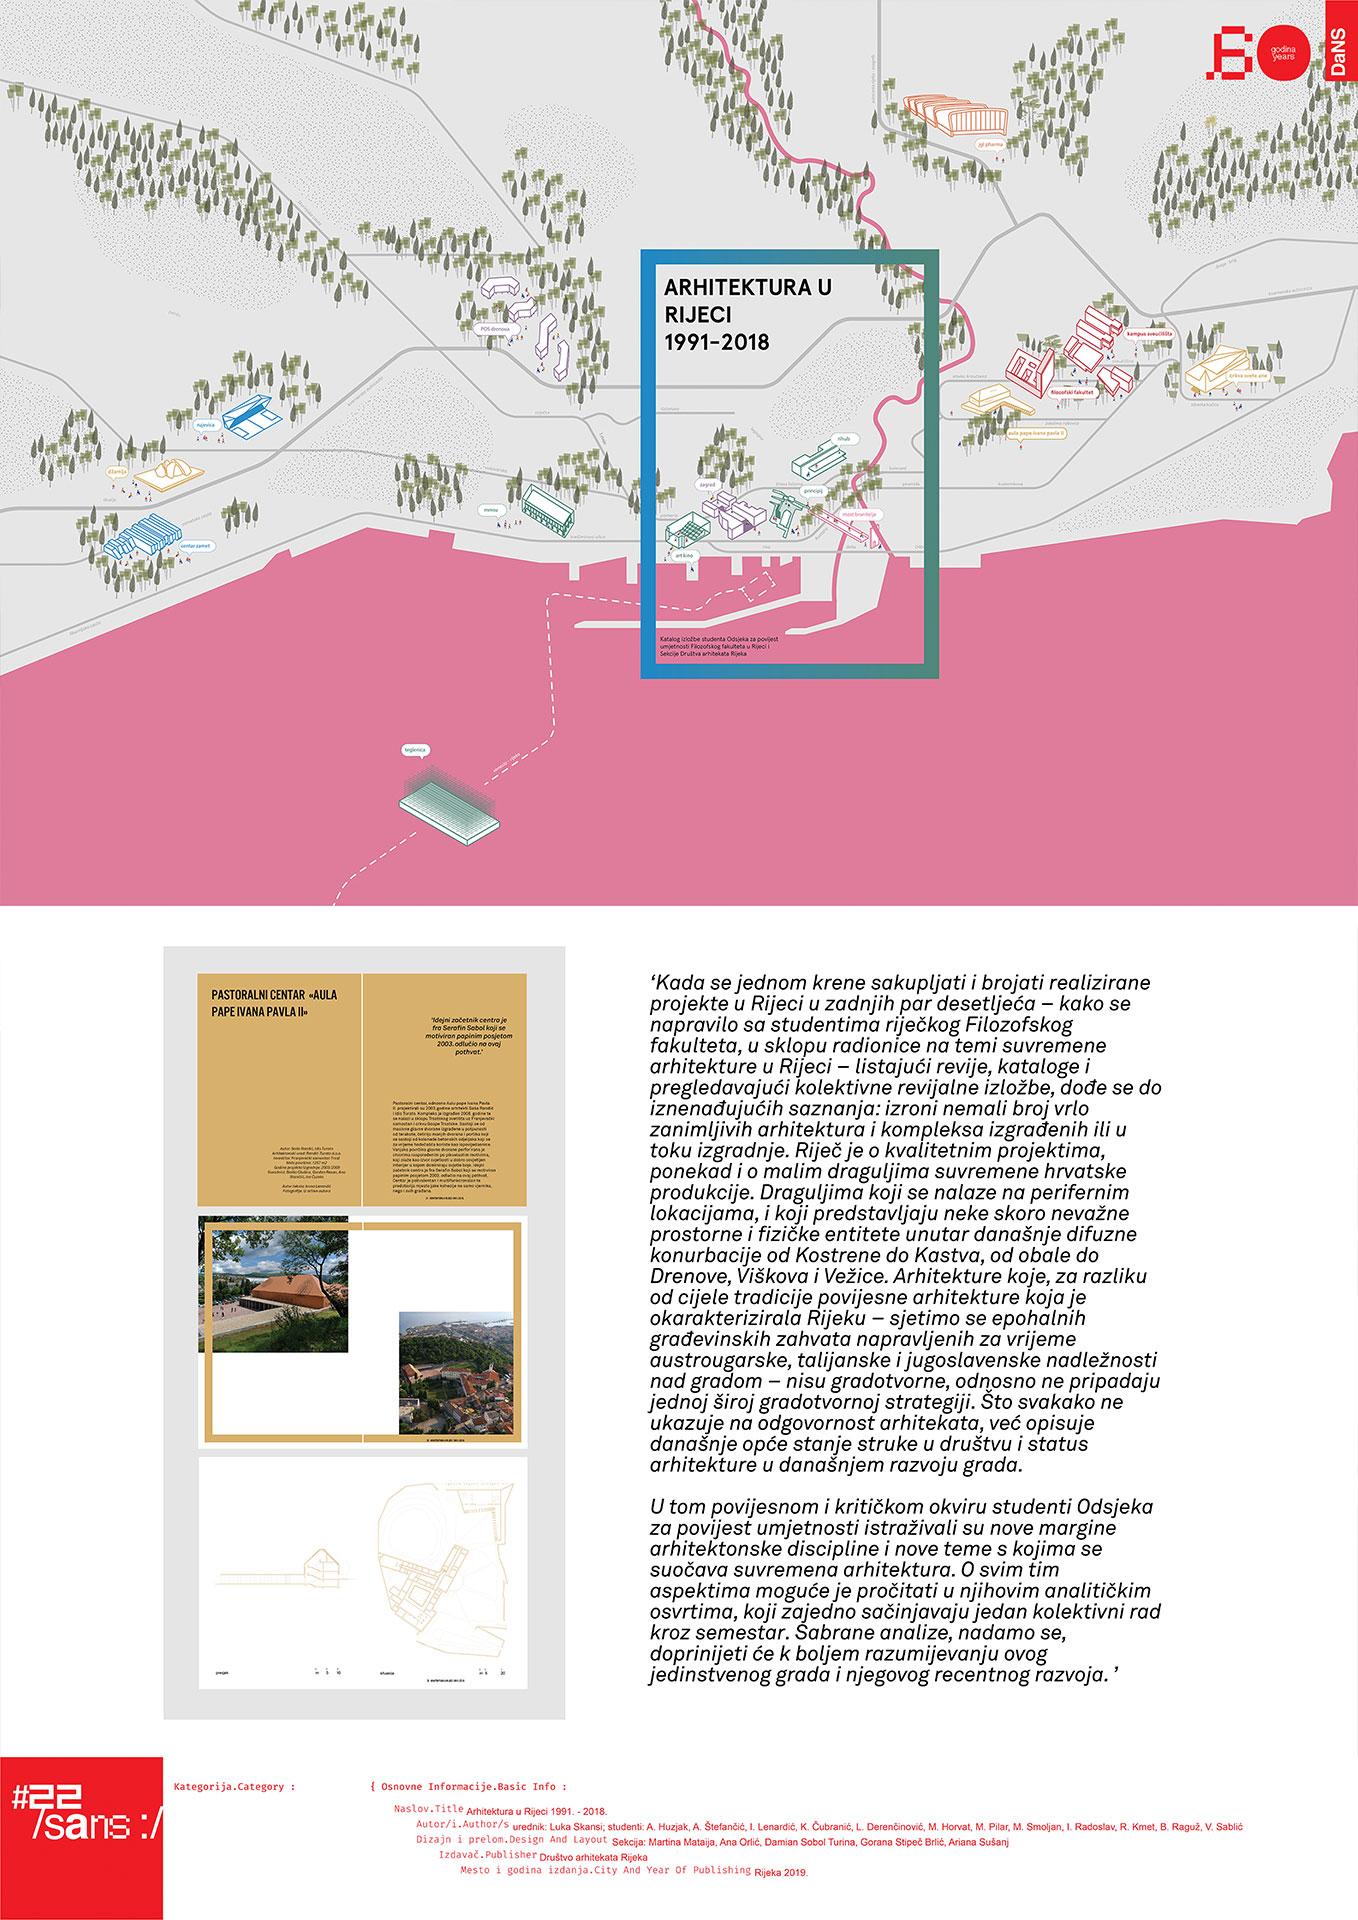 Arhitektura u Rijeci 1991-2018. // Architecture in Rijeka 1991.-2018.